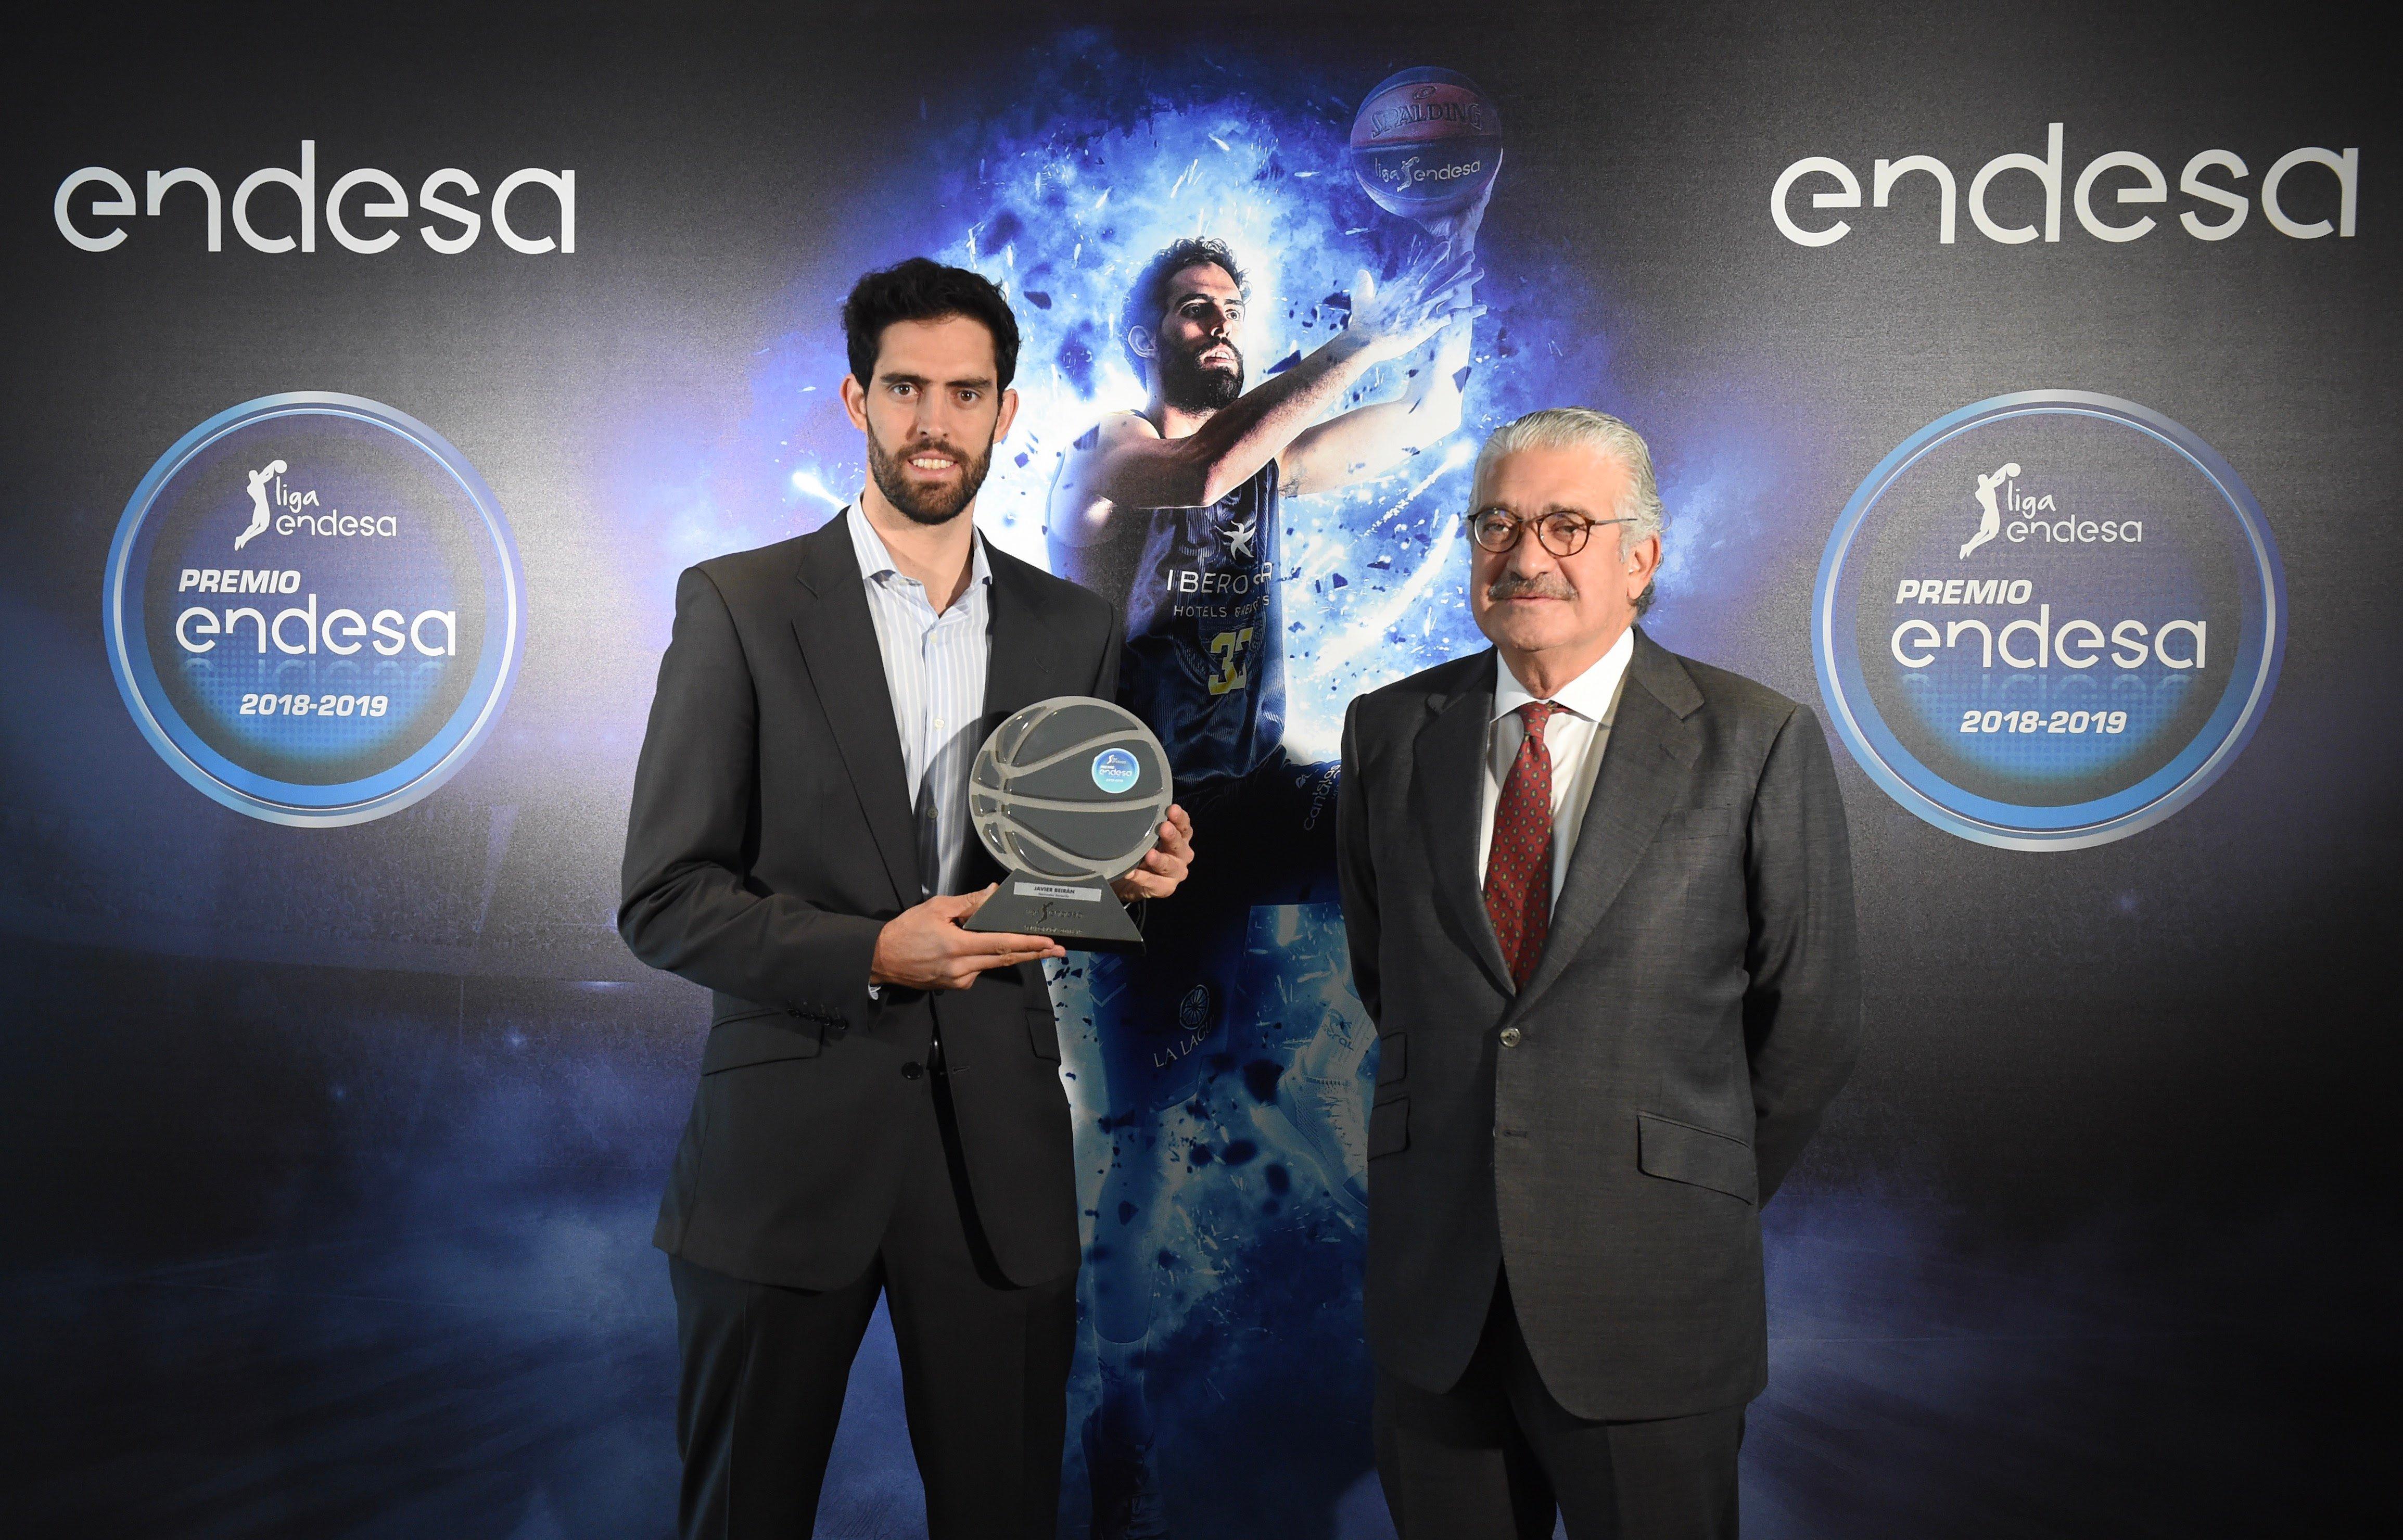 premios_endesa_2019